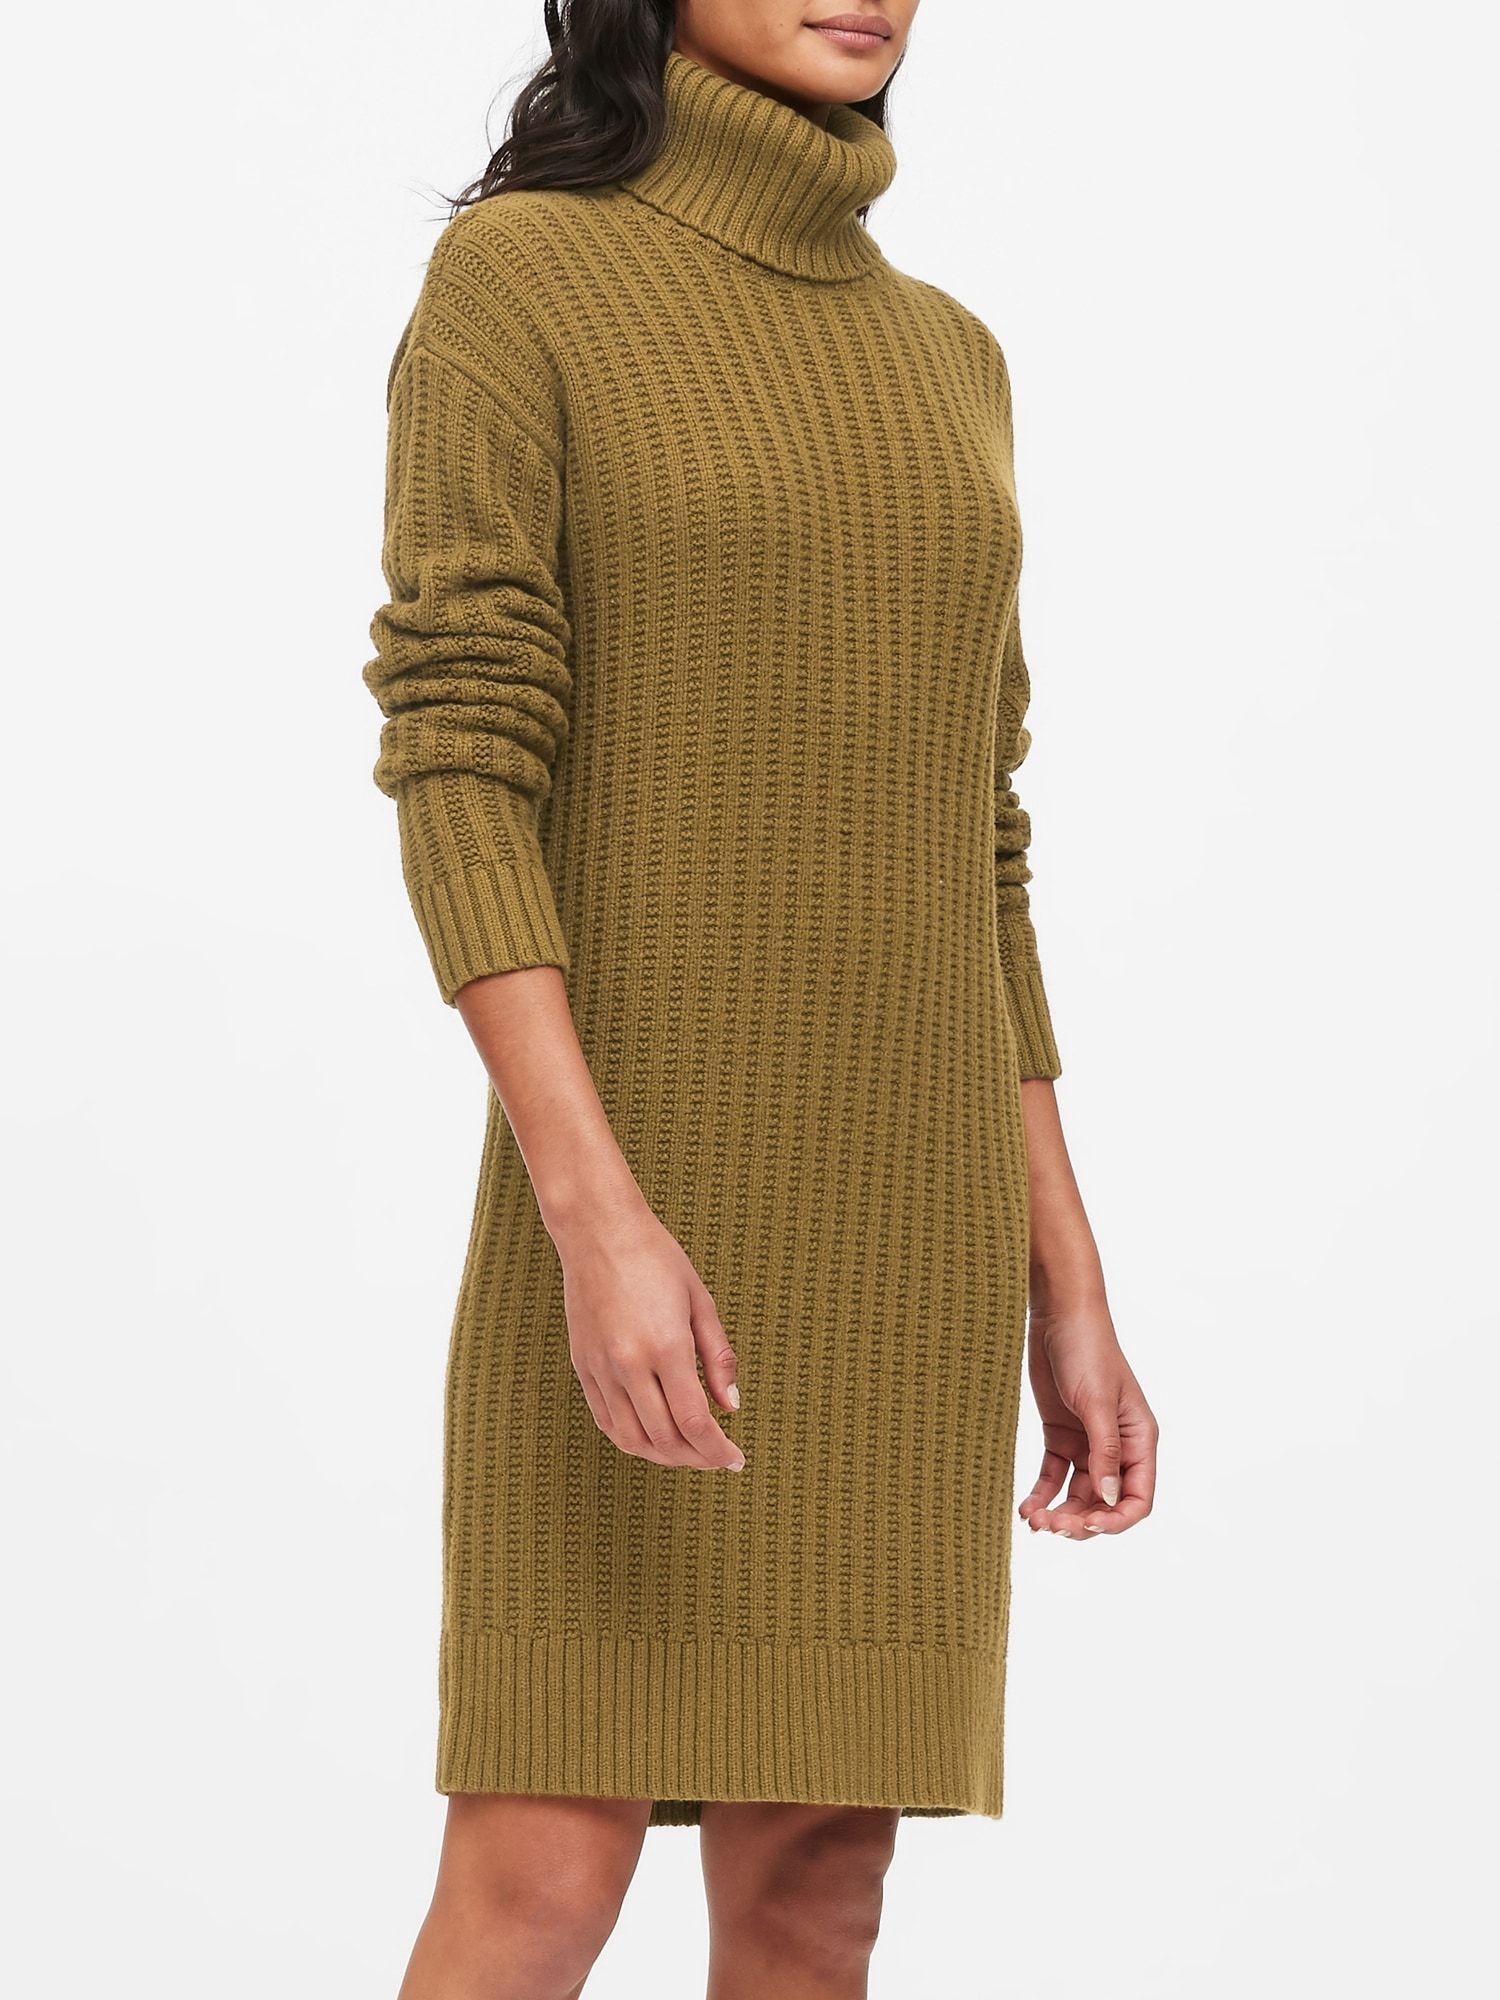 Turtleneck Sweater Dress Sweater Dress Chunky Turtleneck Sweater Turtleneck Sweater Dress [ 2000 x 1500 Pixel ]